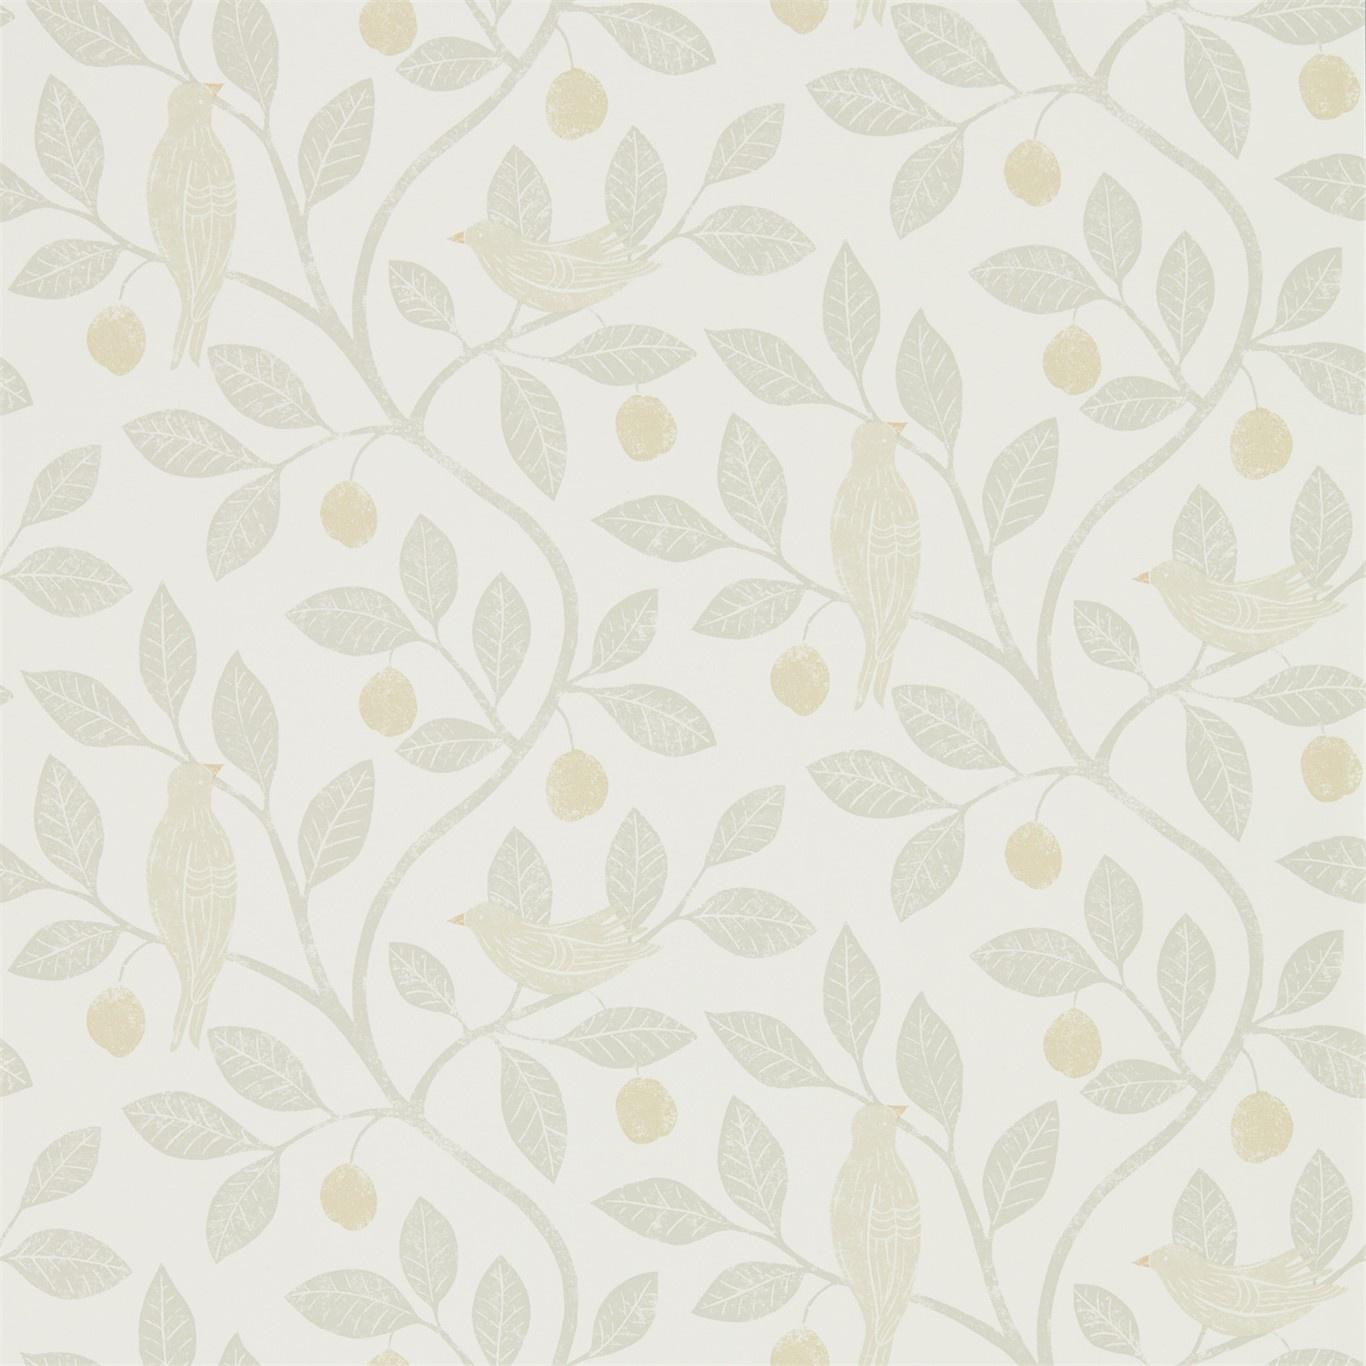 Image of Sanderson Home Damson Tree Linen/Honey Wallpaper 216366